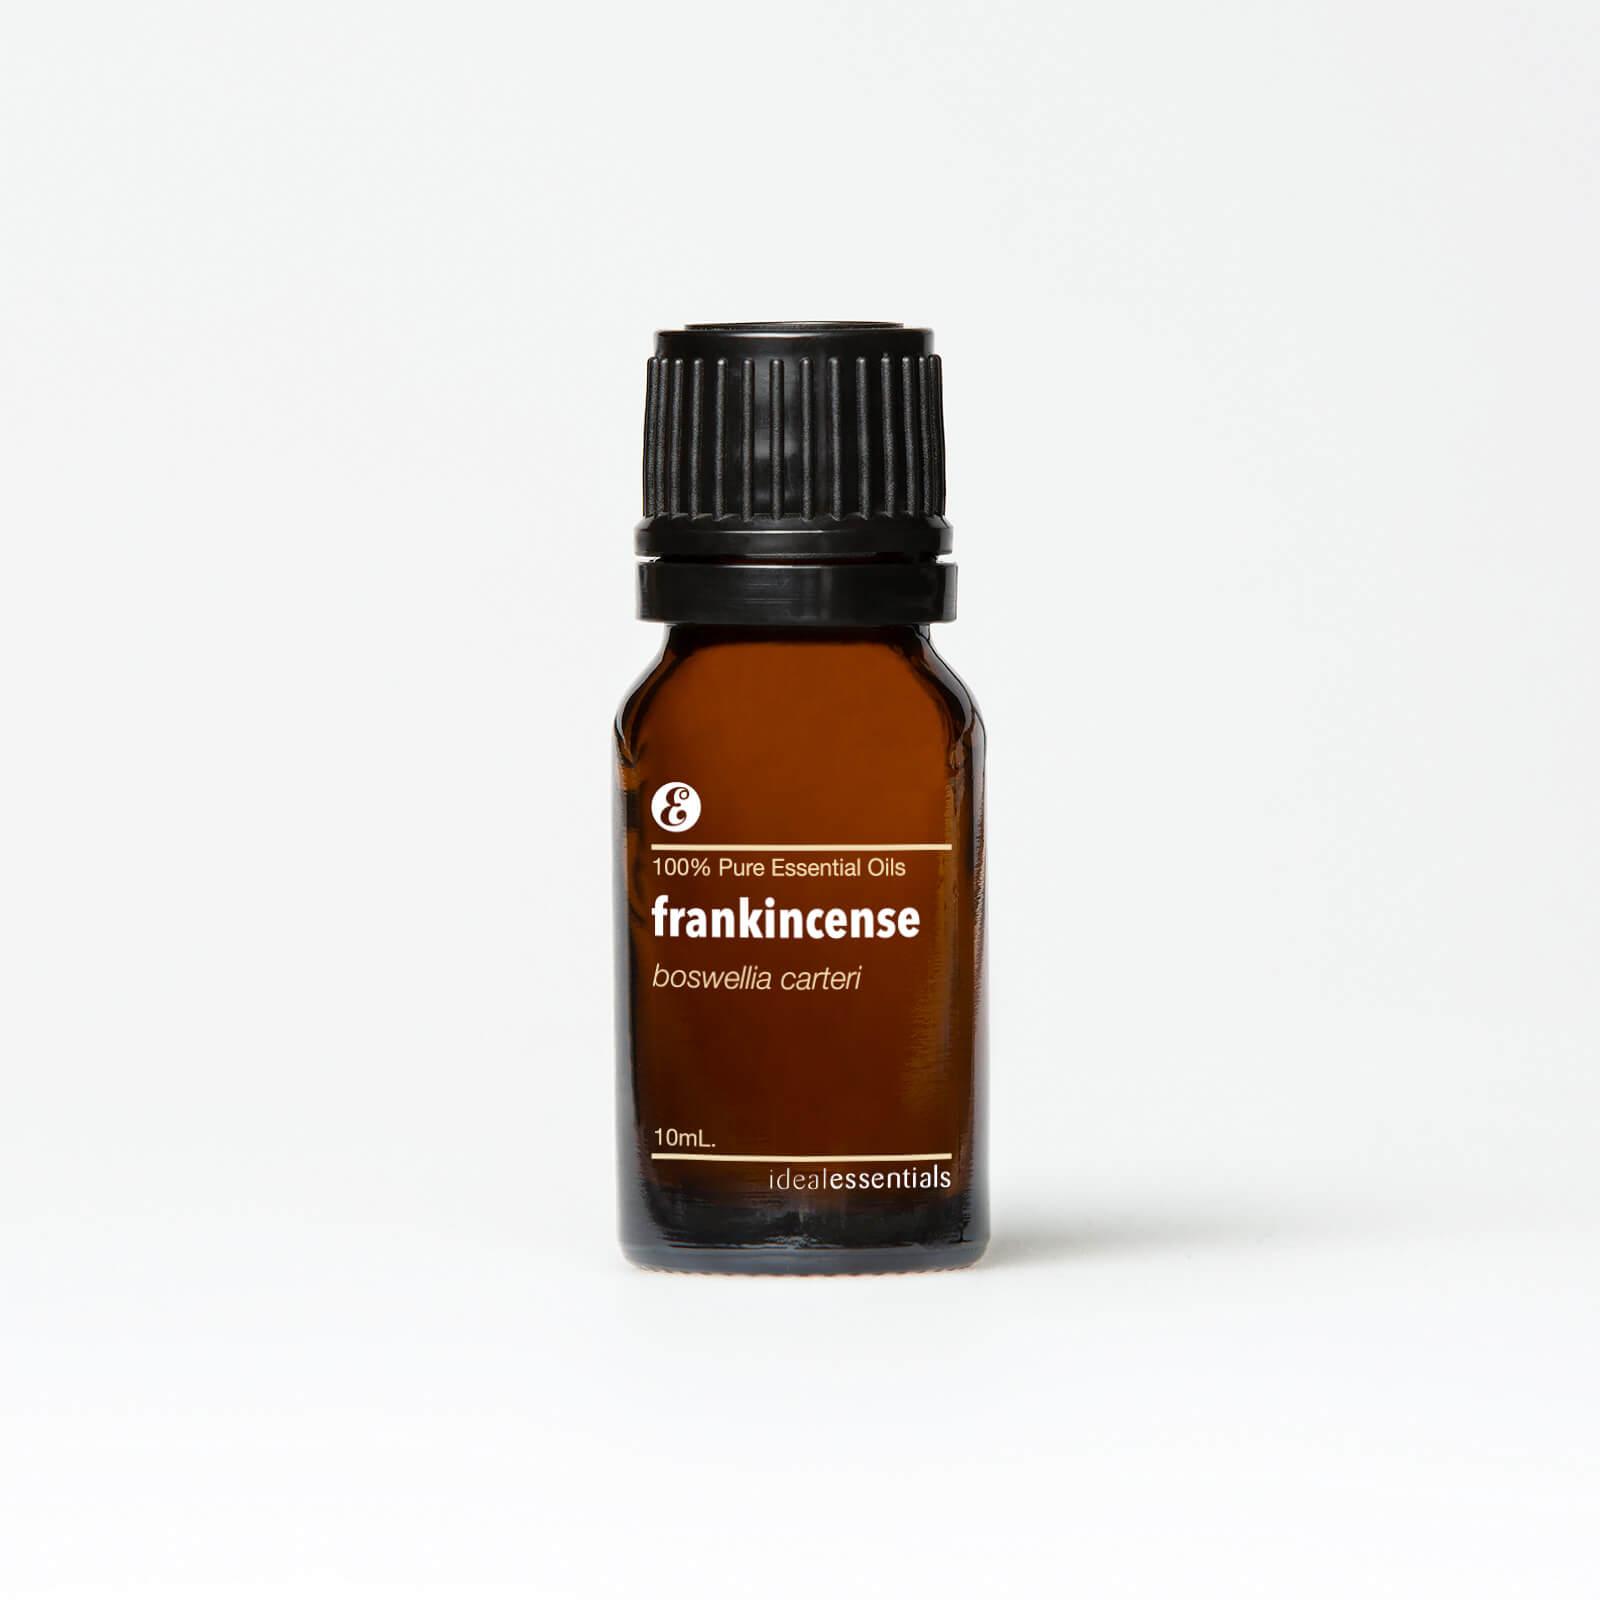 IdealEssentials Frankincense